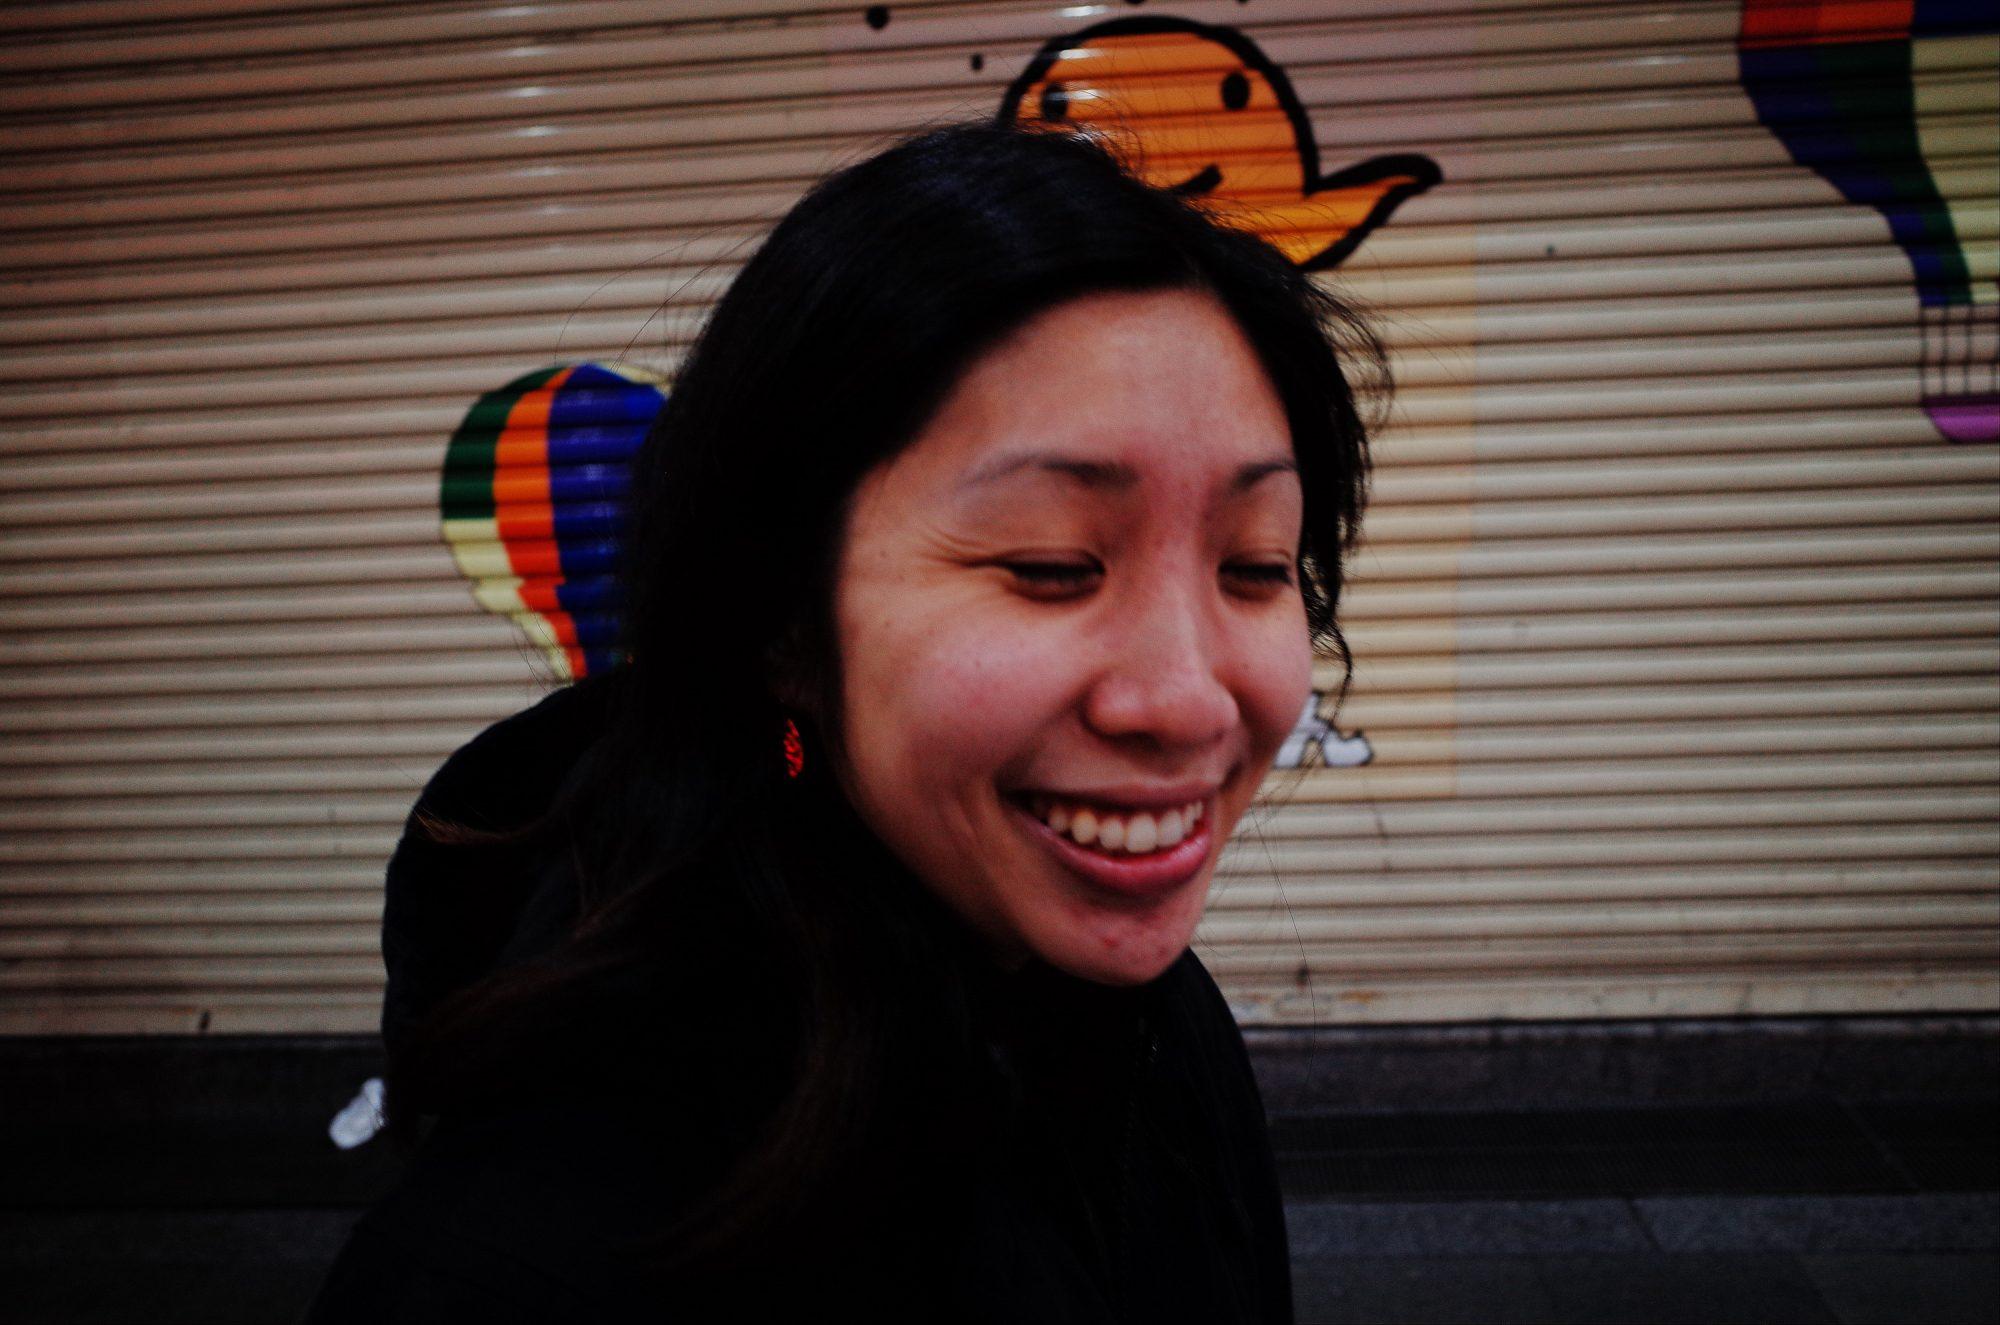 Cindy laughing. Osaka, 2018